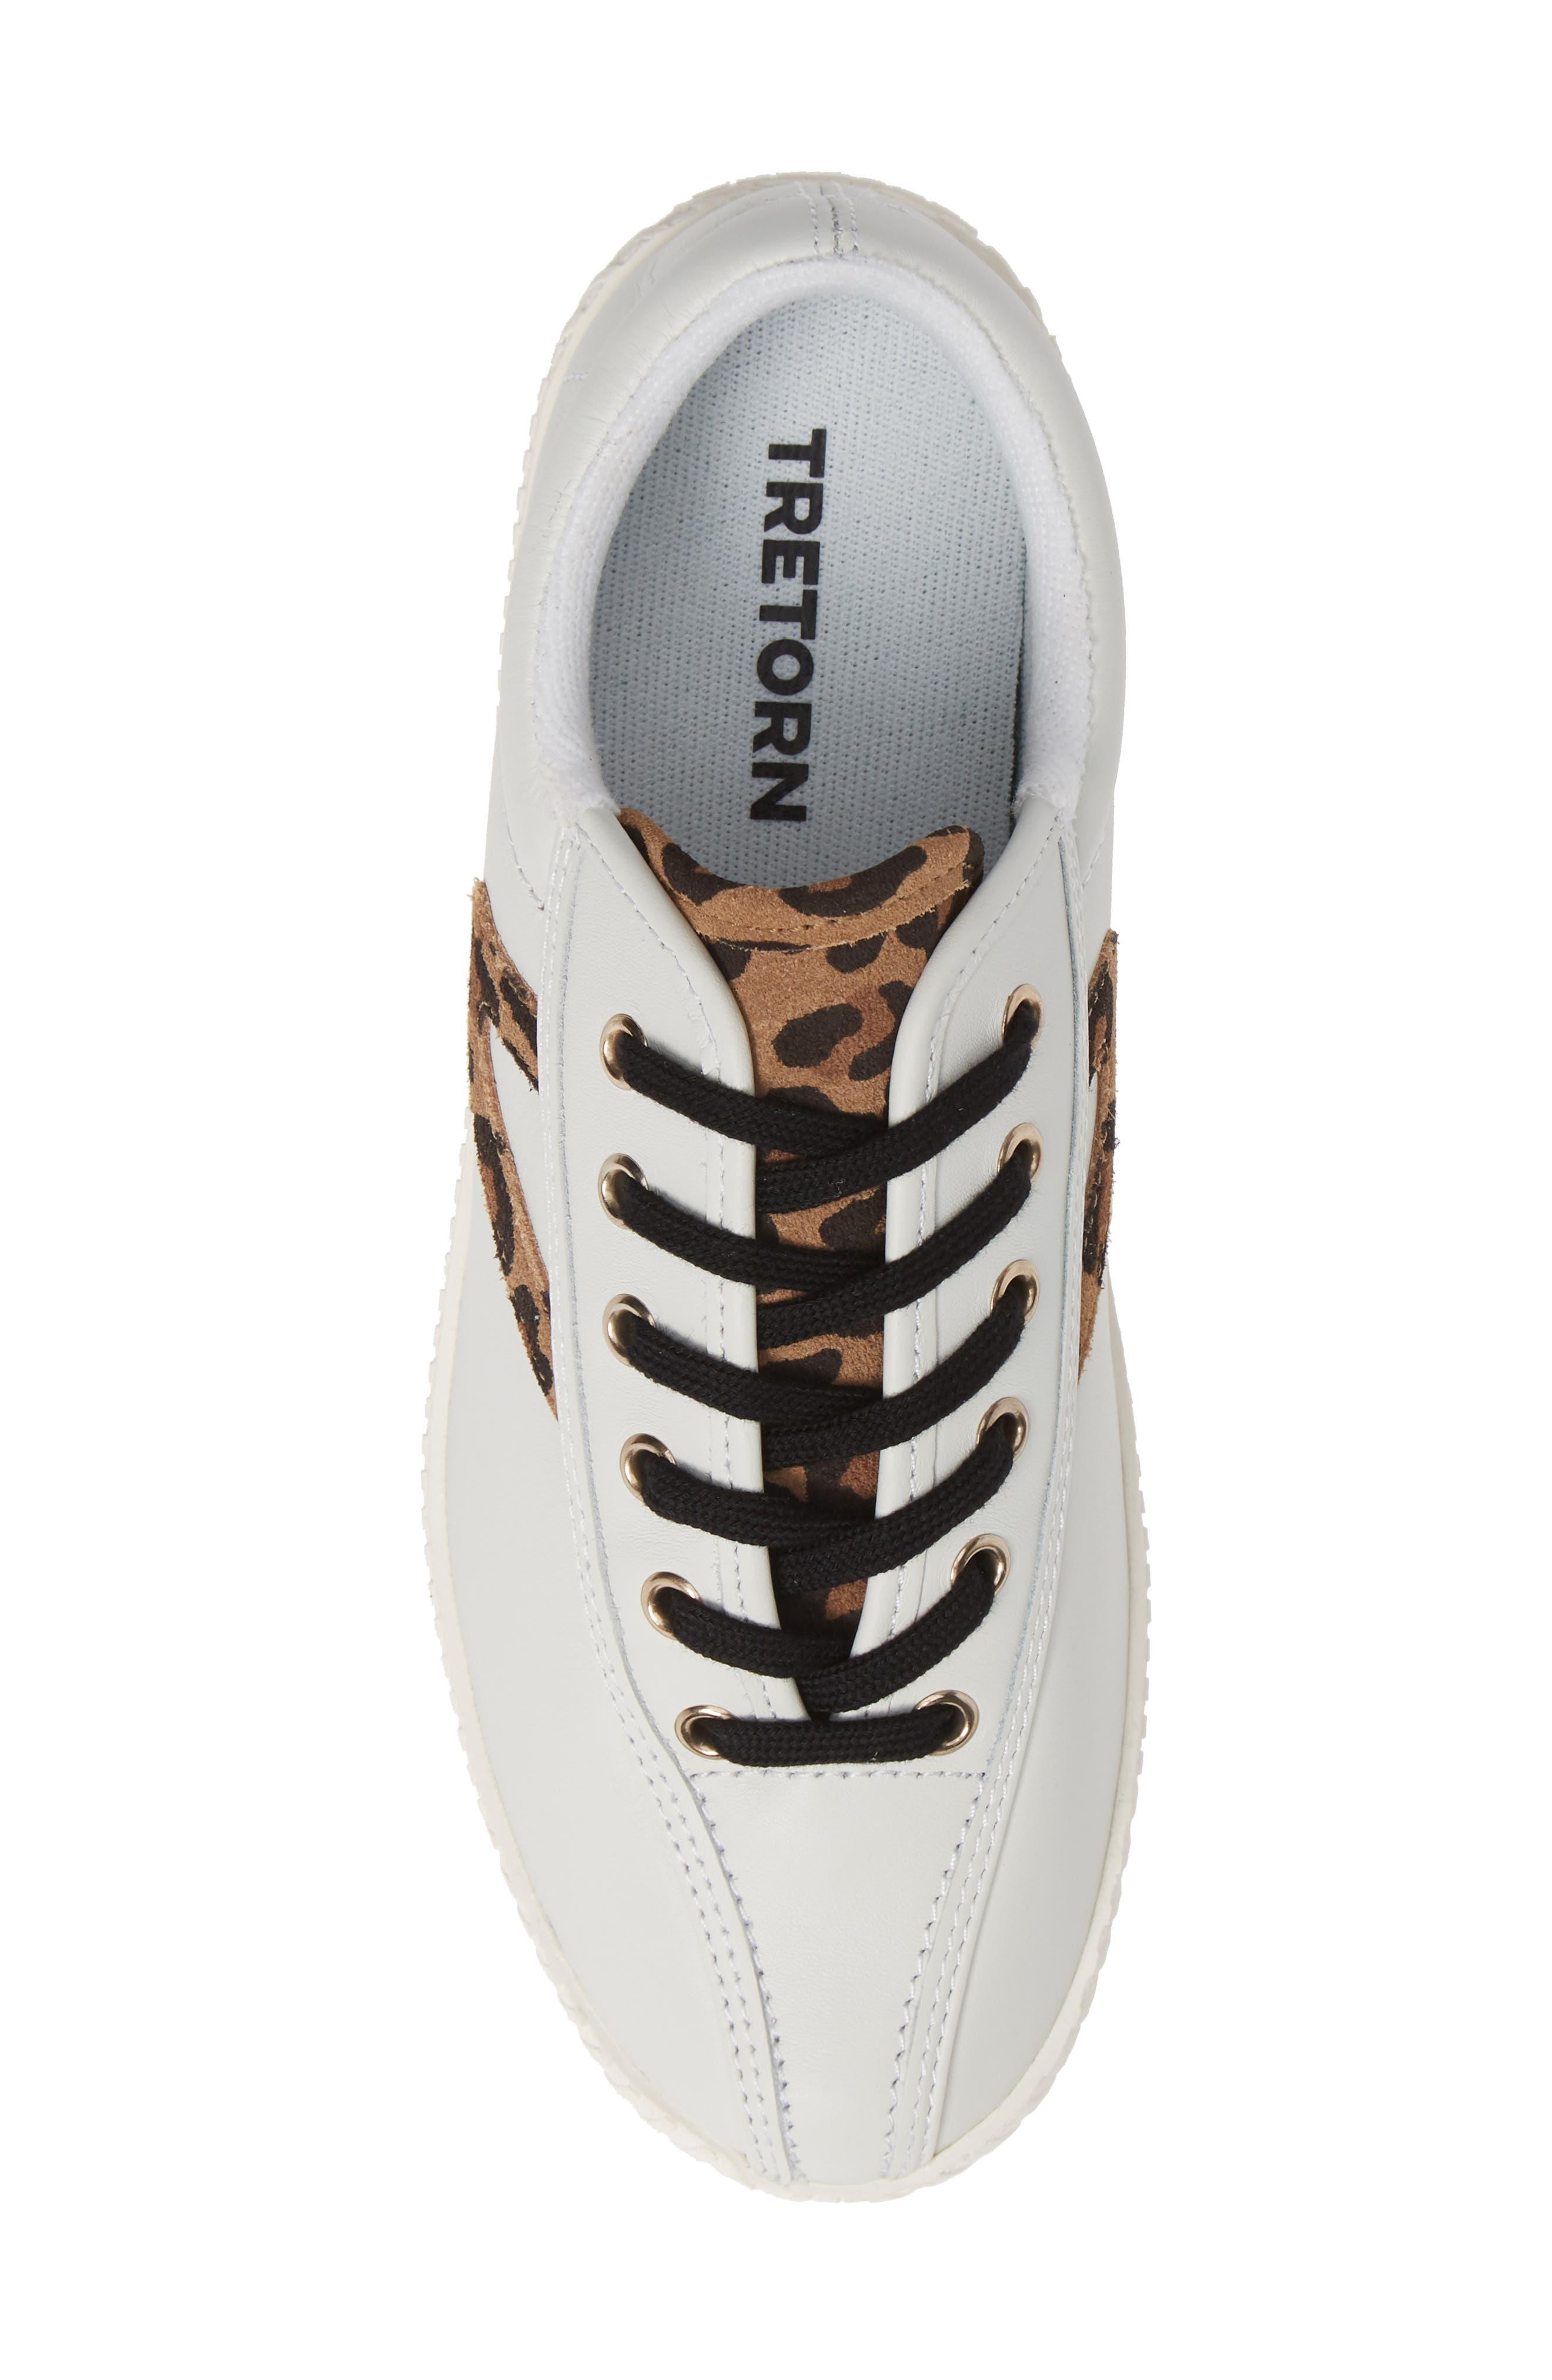 Patterned Sneaker,                             Alternate thumbnail 6, color,                             Vintage White/ Tan Multi